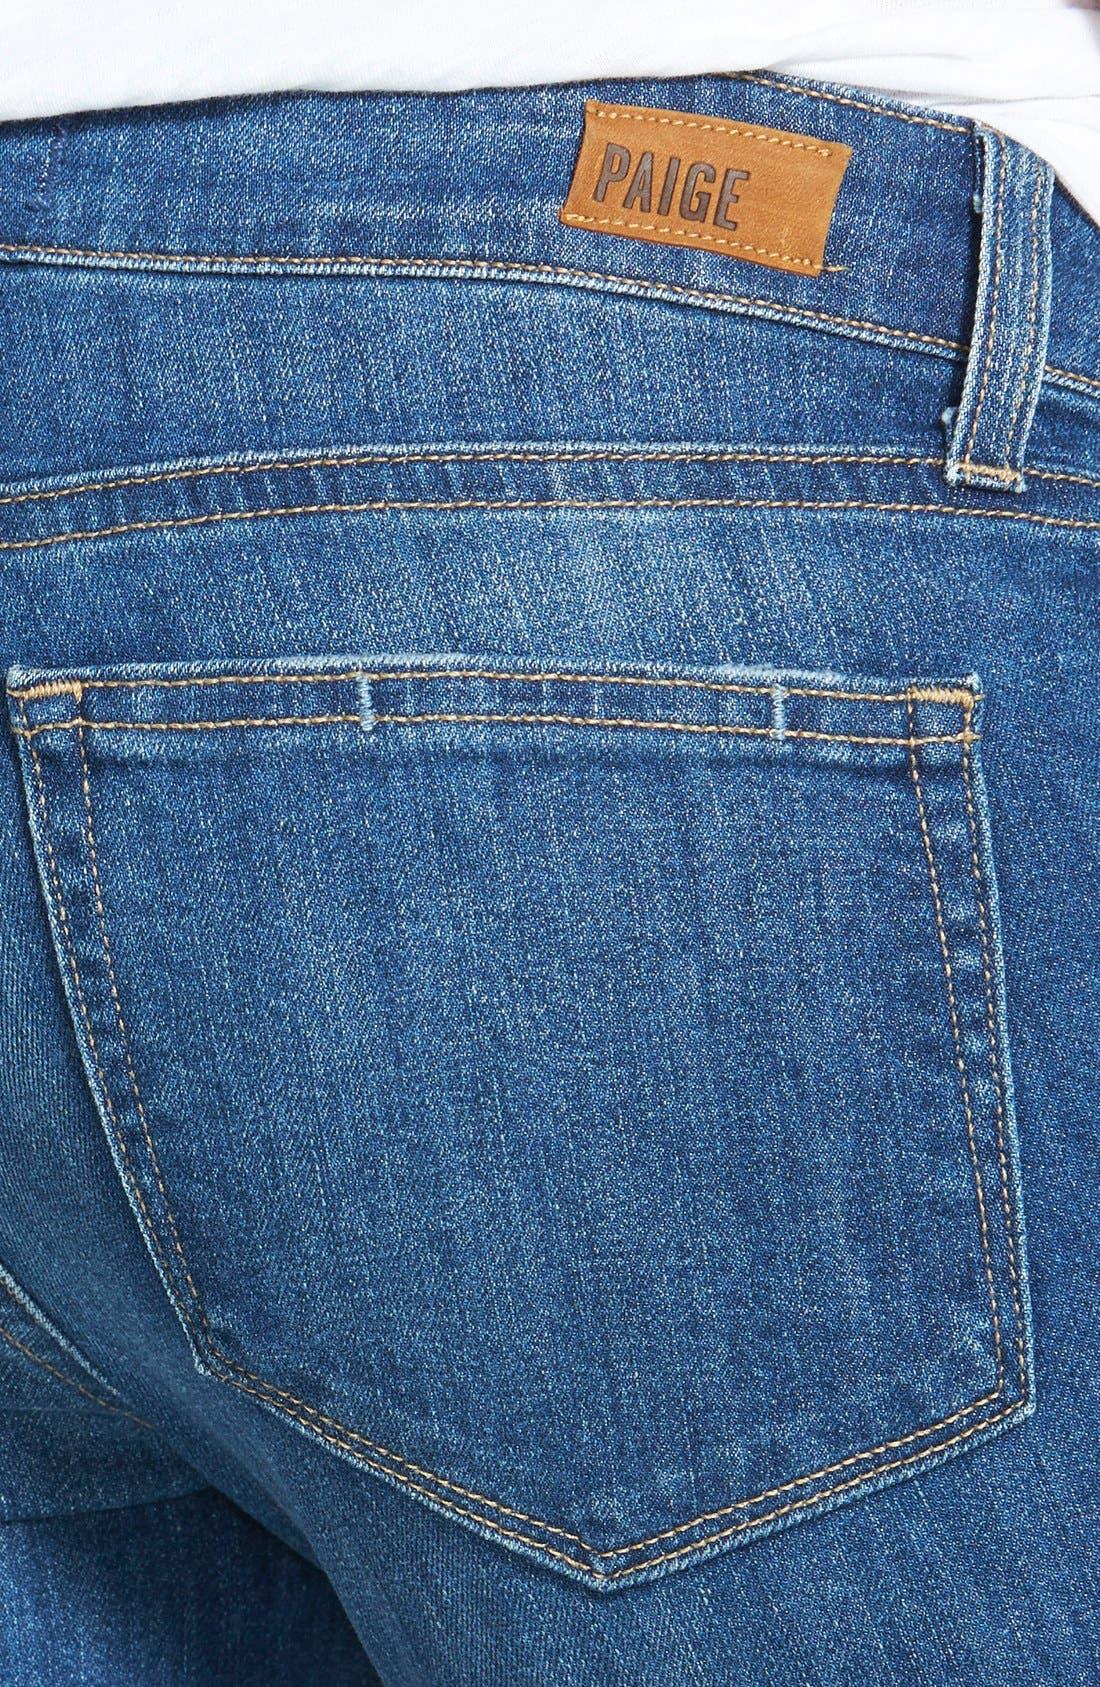 Alternate Image 3  - Paige Denim 'Skyline' Bootcut Jeans (Frances)